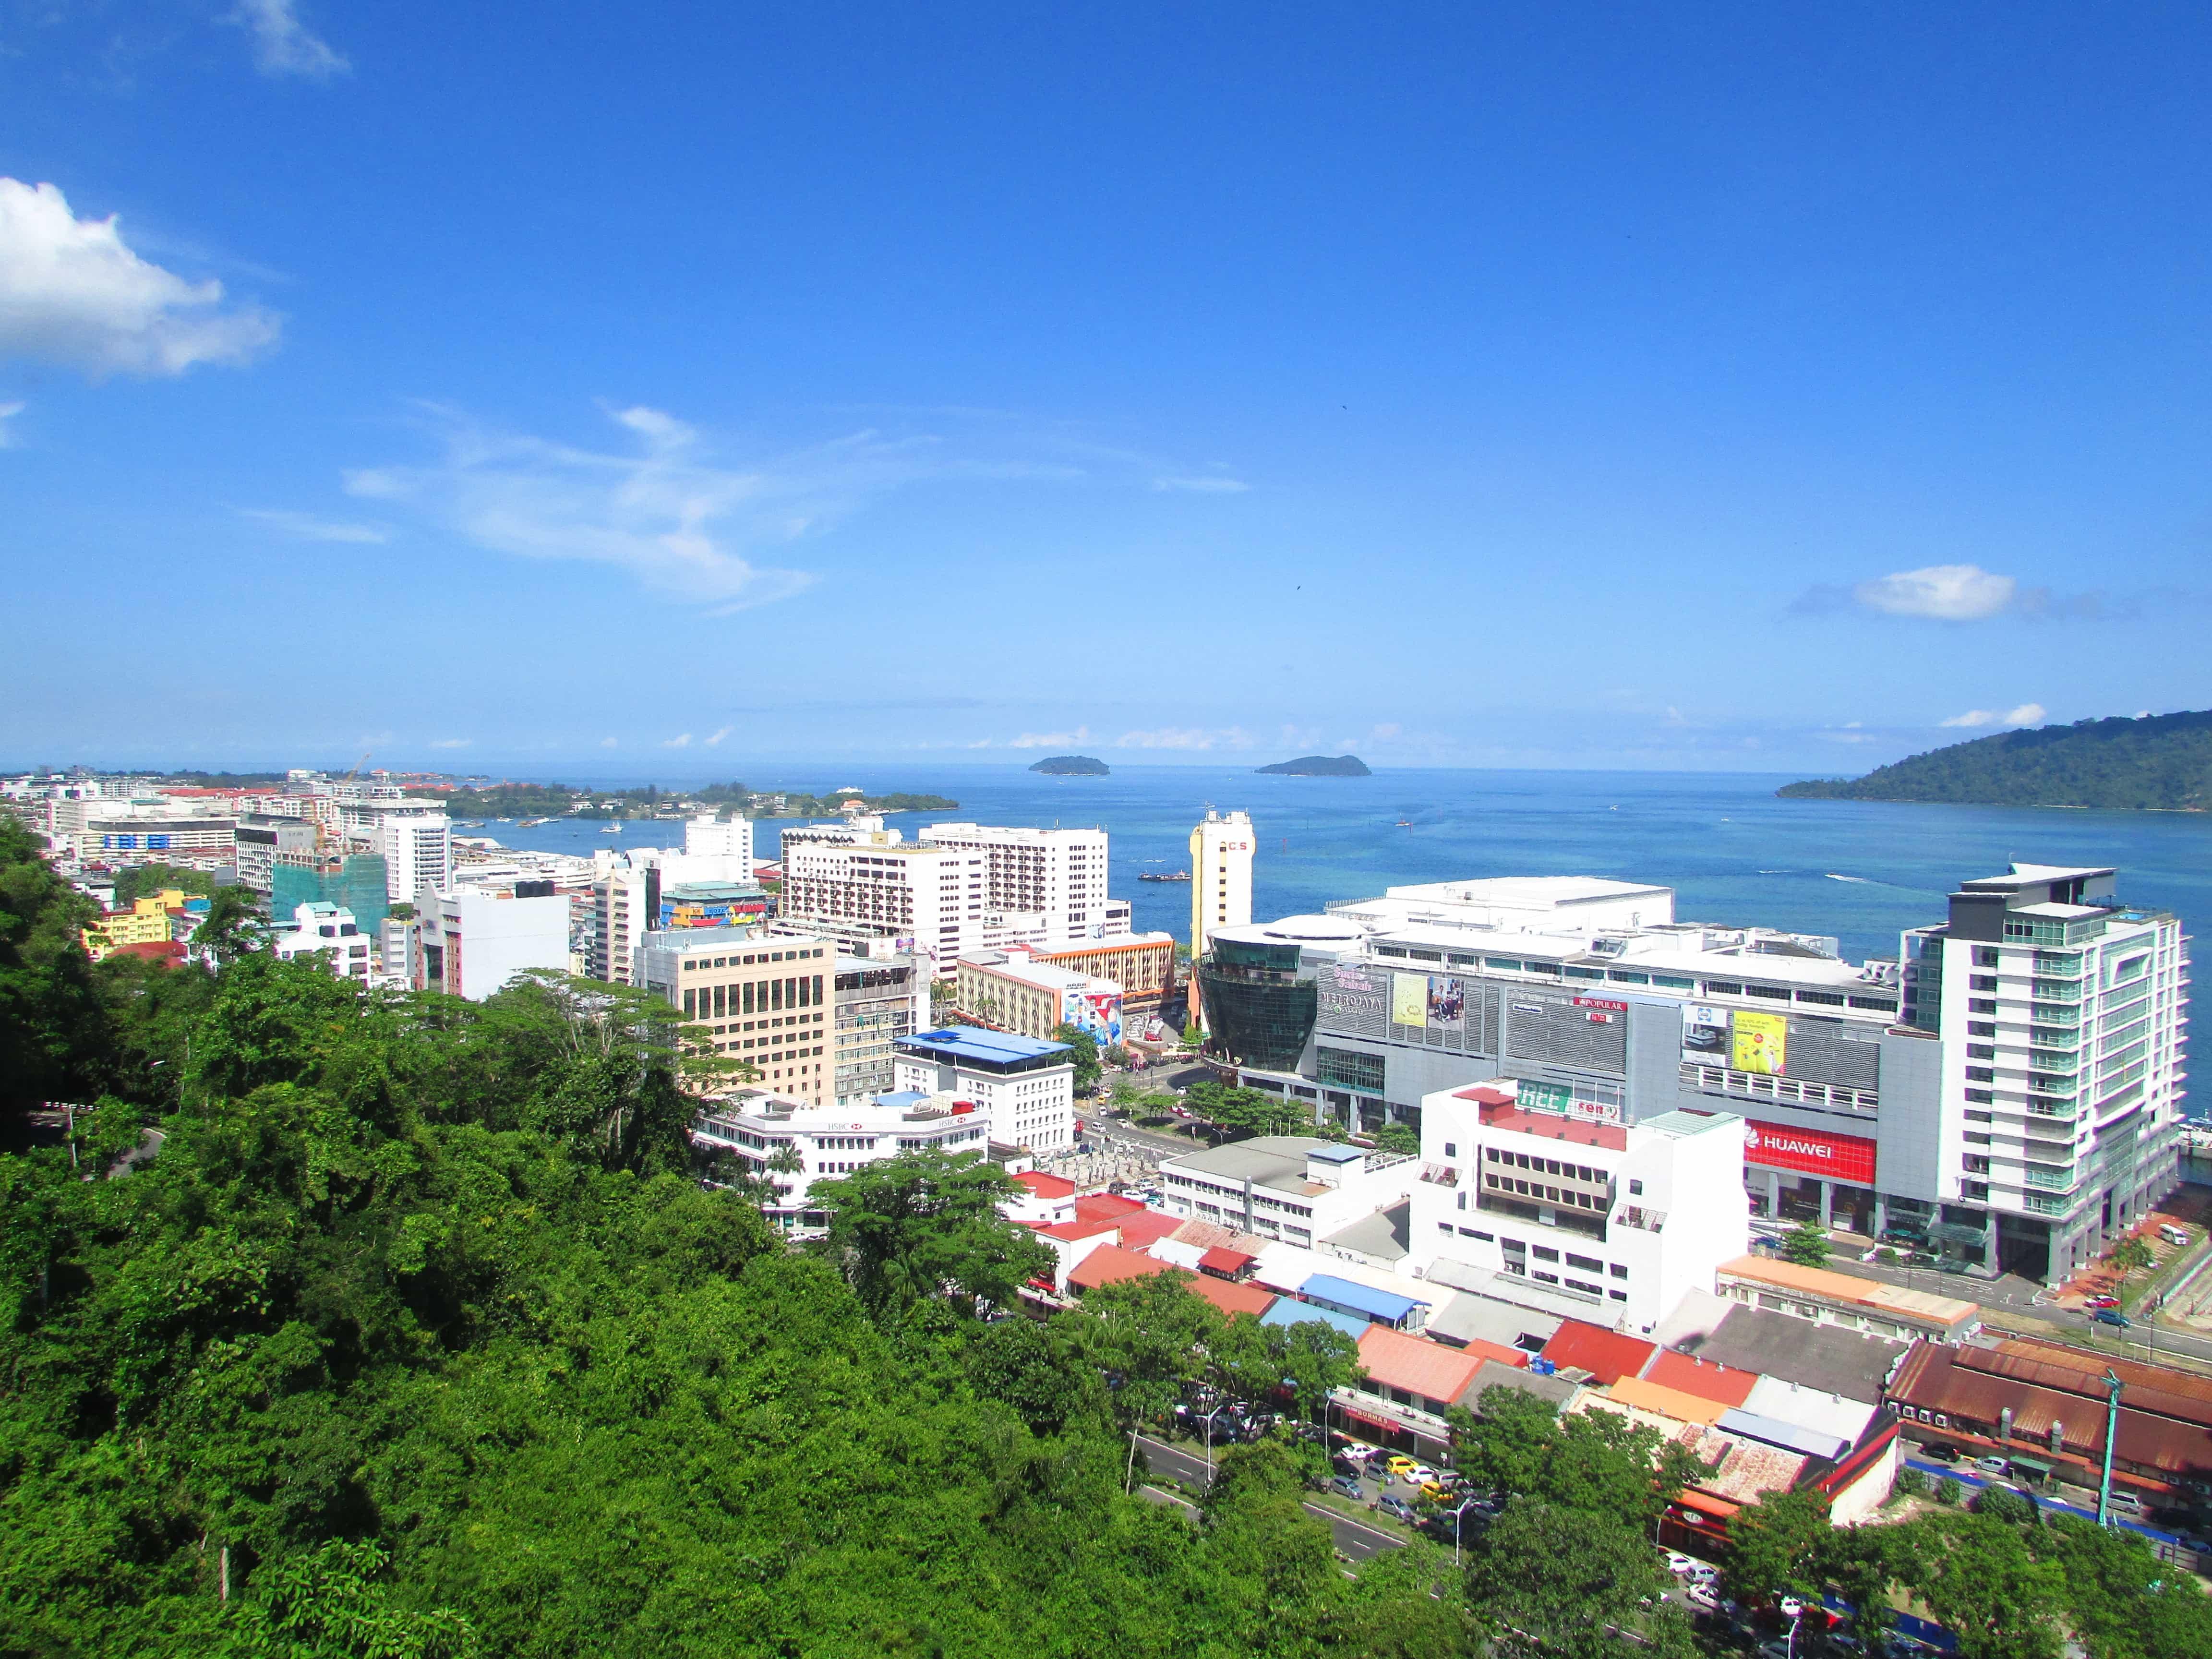 Kota Kinabalu, Malaysia tourist spots